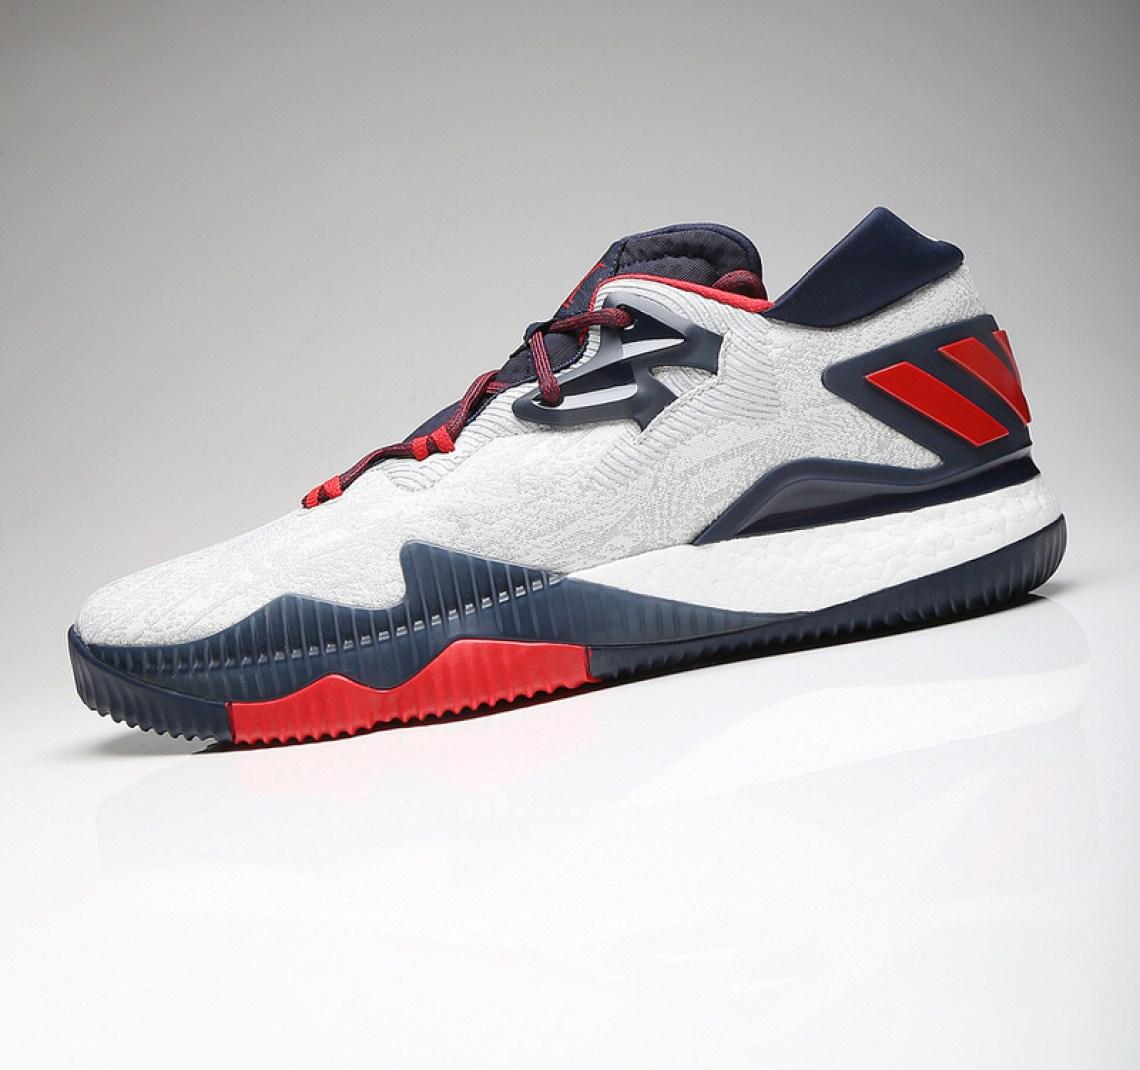 Kyle Lowry Adidas Basketball Shoes